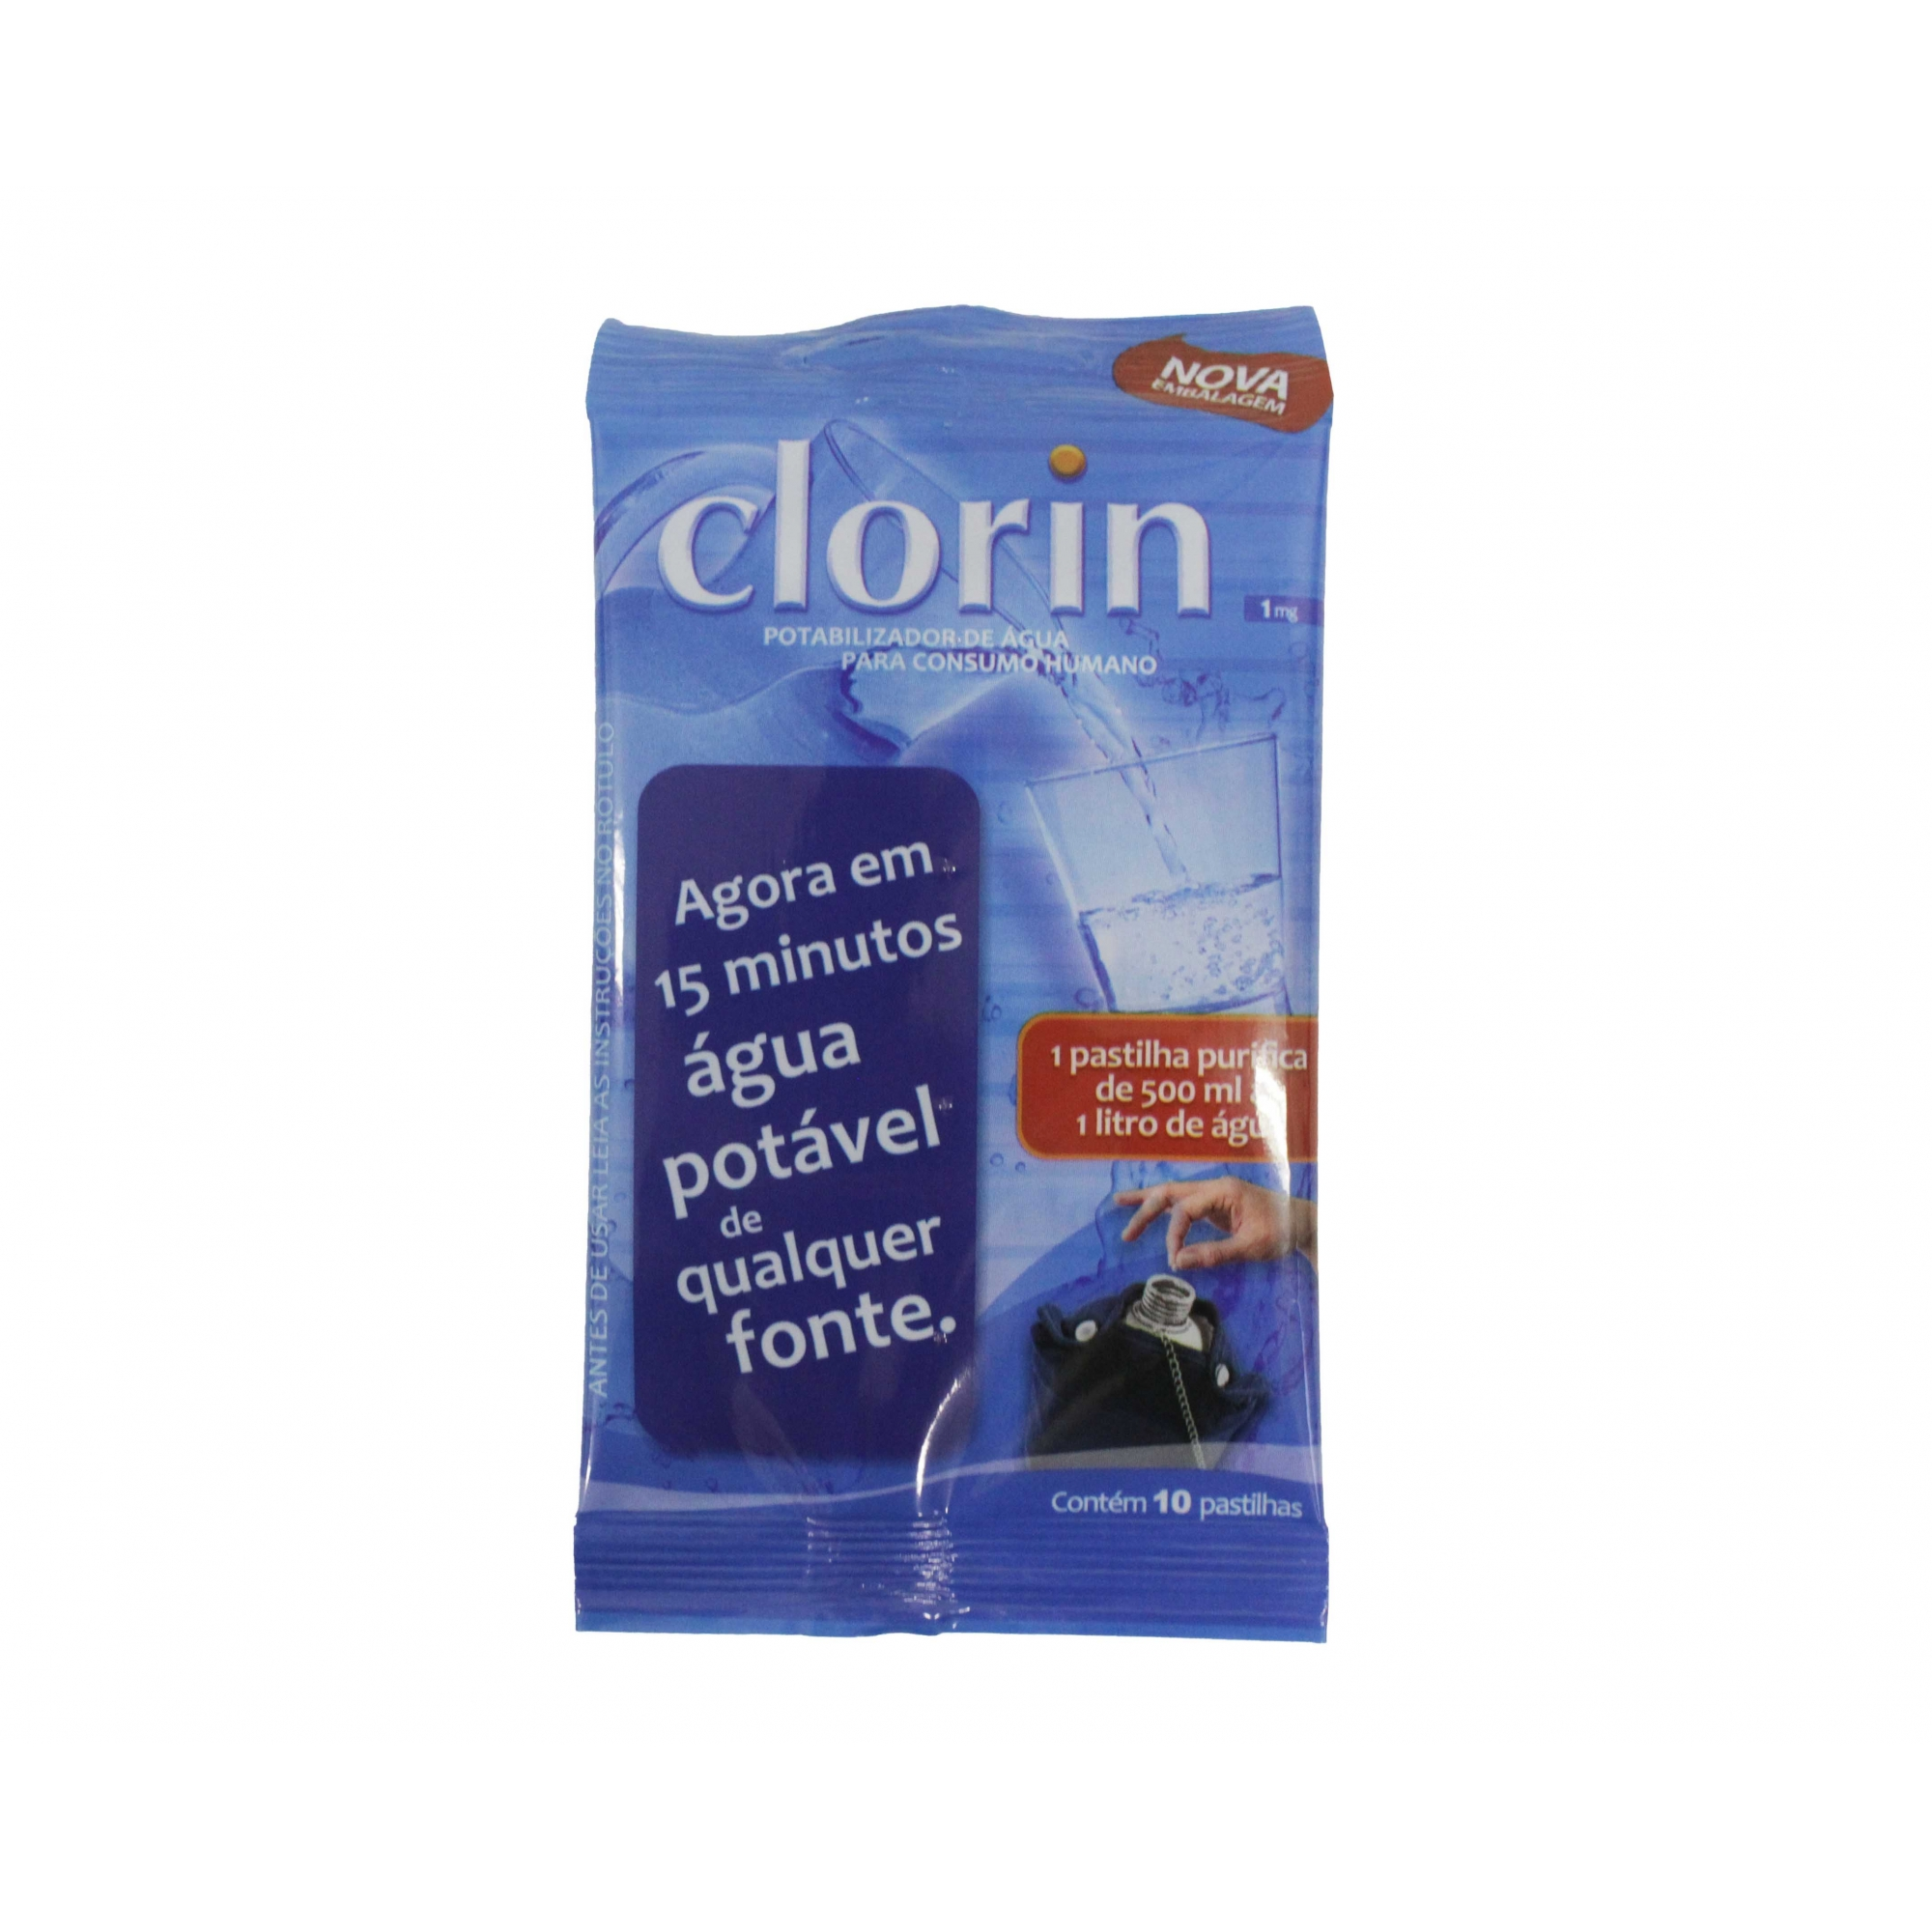 Clorin 1 mg Cartela com 10 unidades